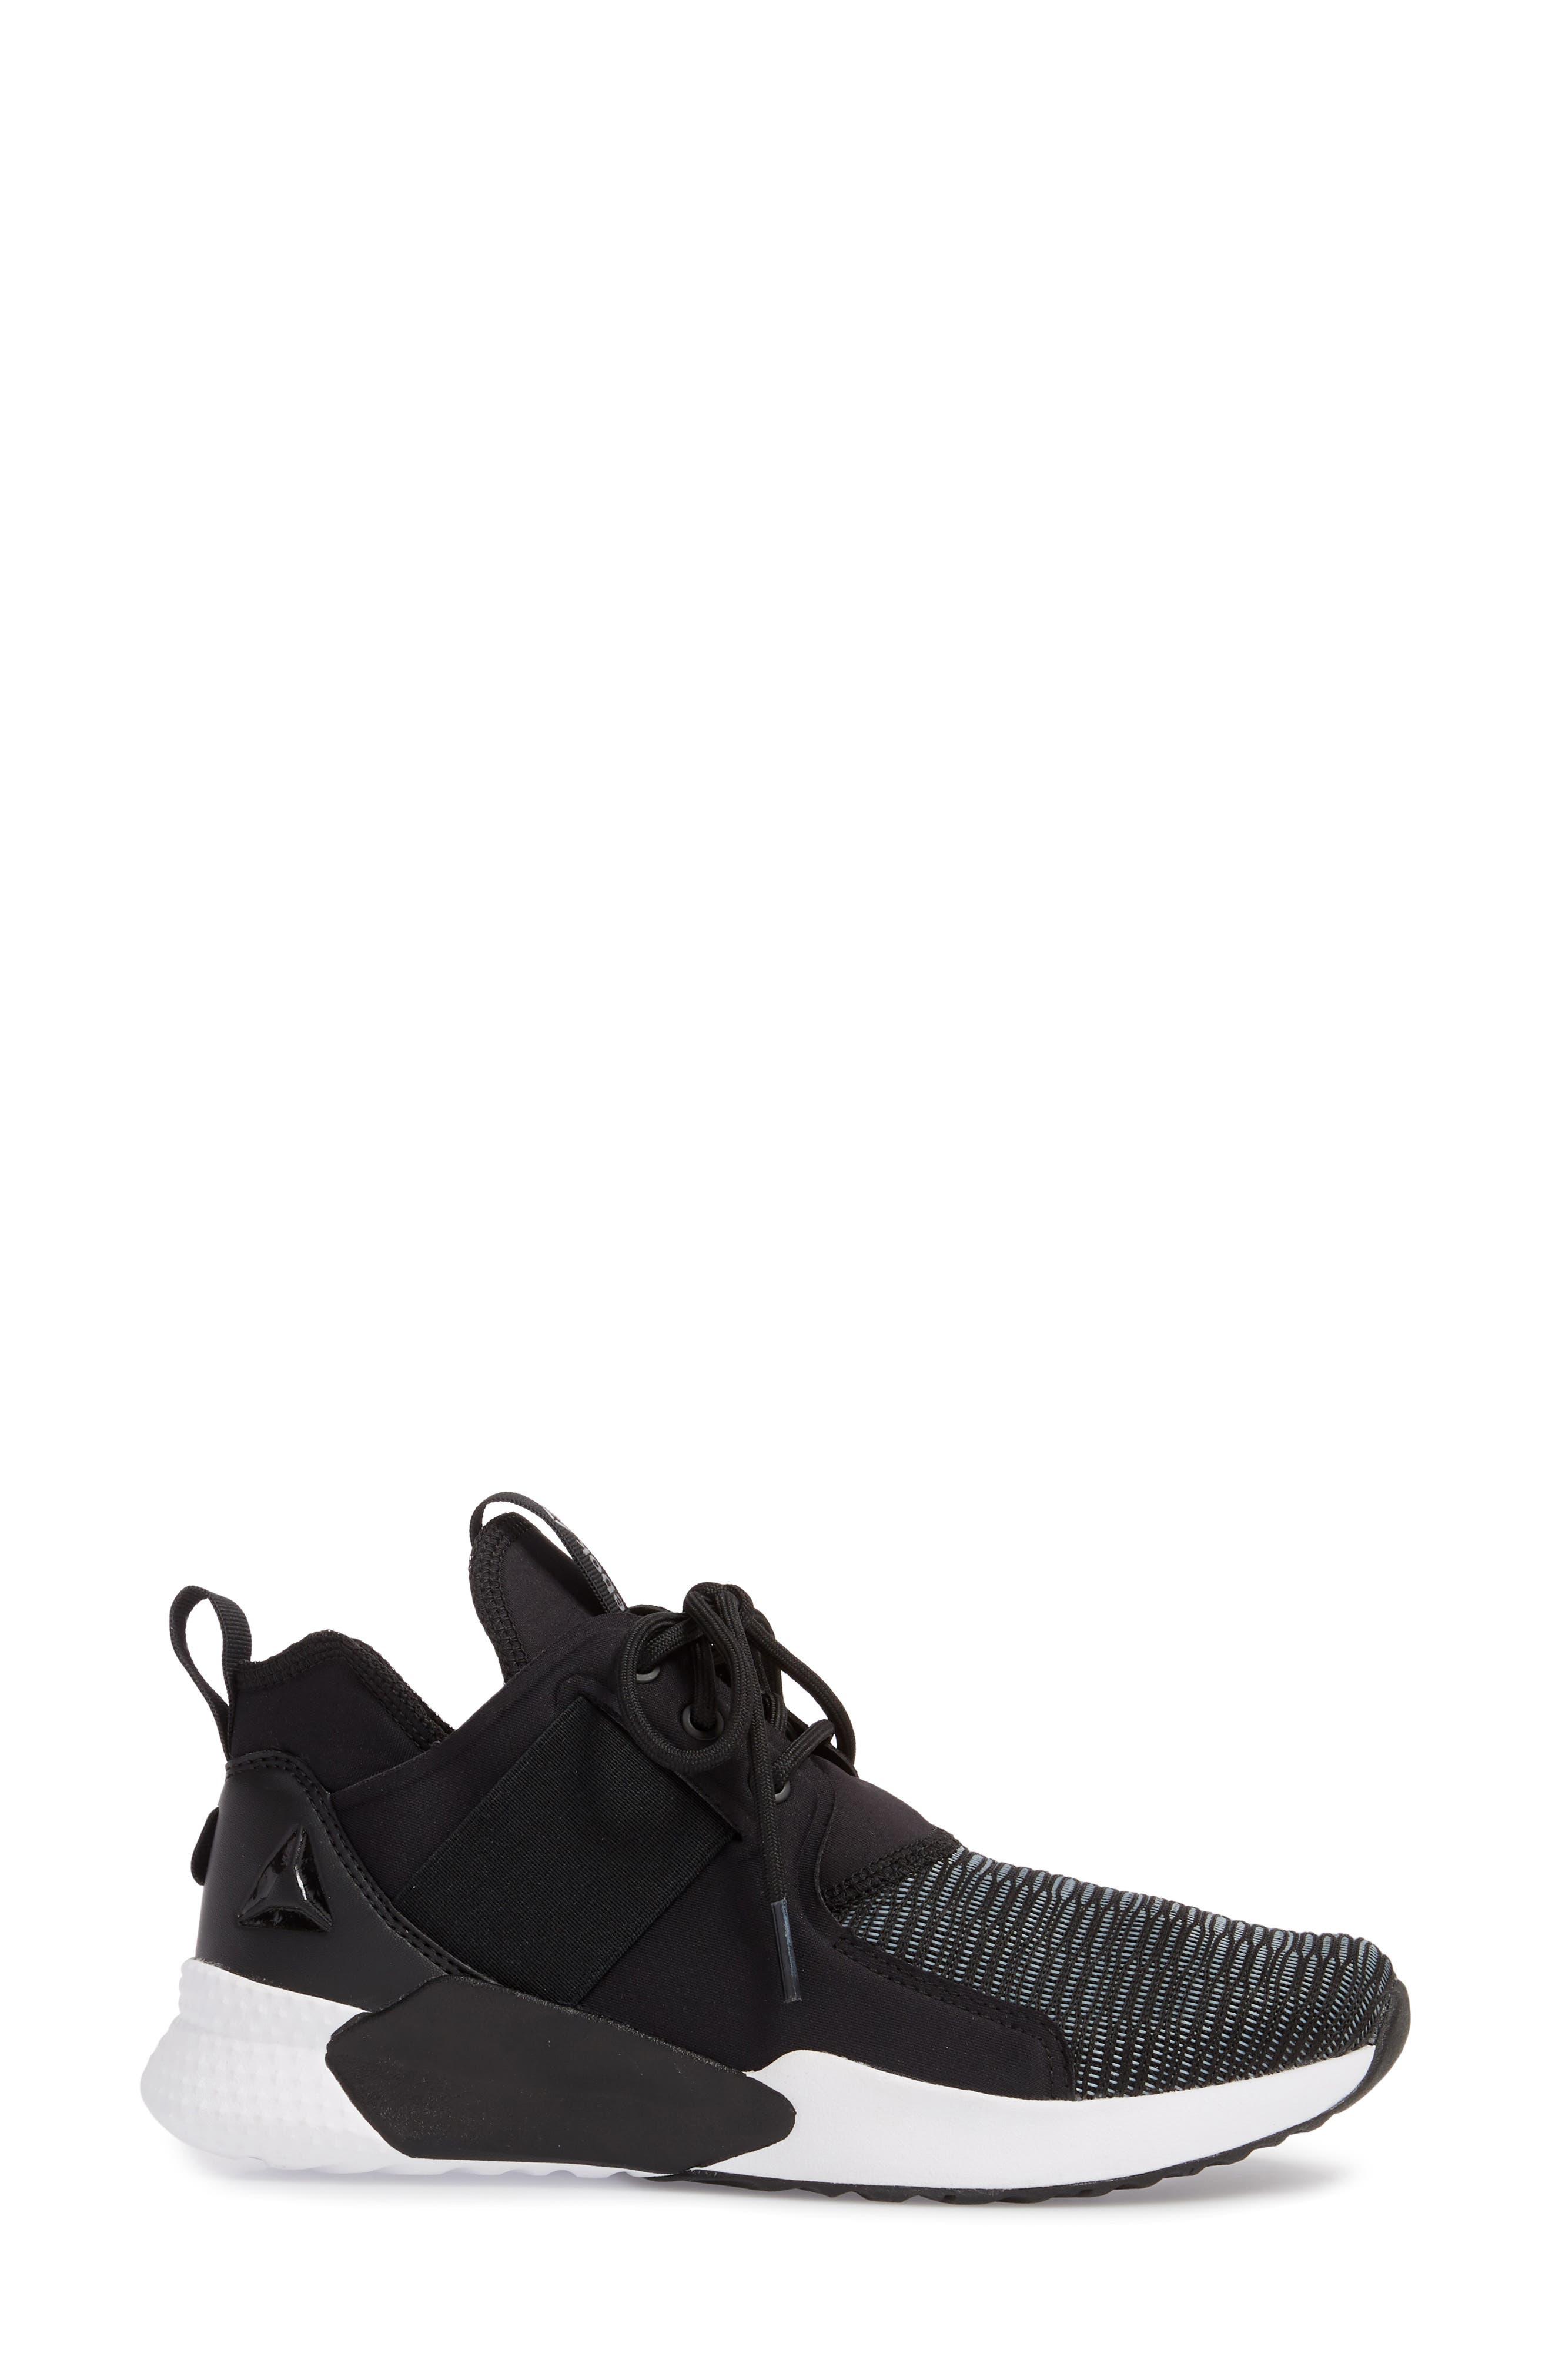 Guresu 1.0 High Top Sneaker,                             Alternate thumbnail 3, color,                             Black/ White